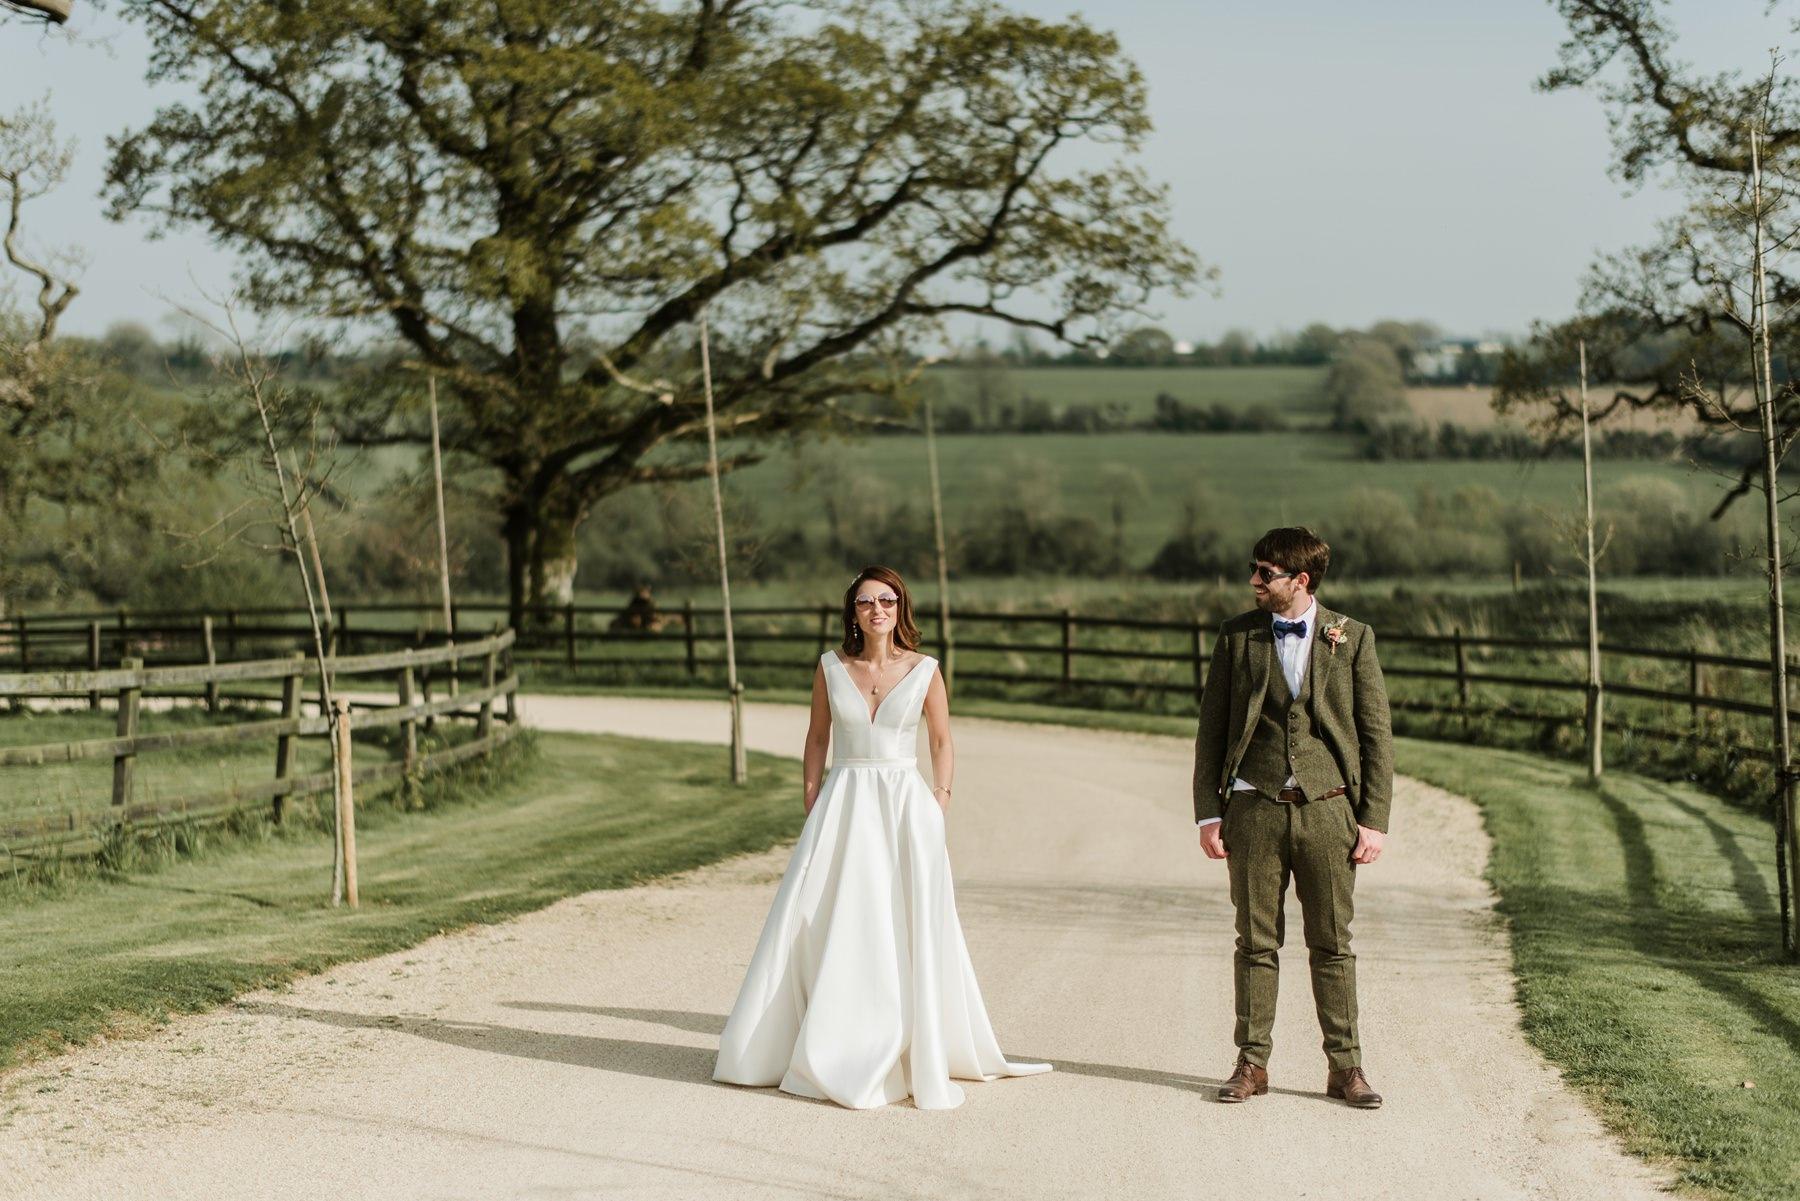 summer wedding, horetown house, outdoor ceremony